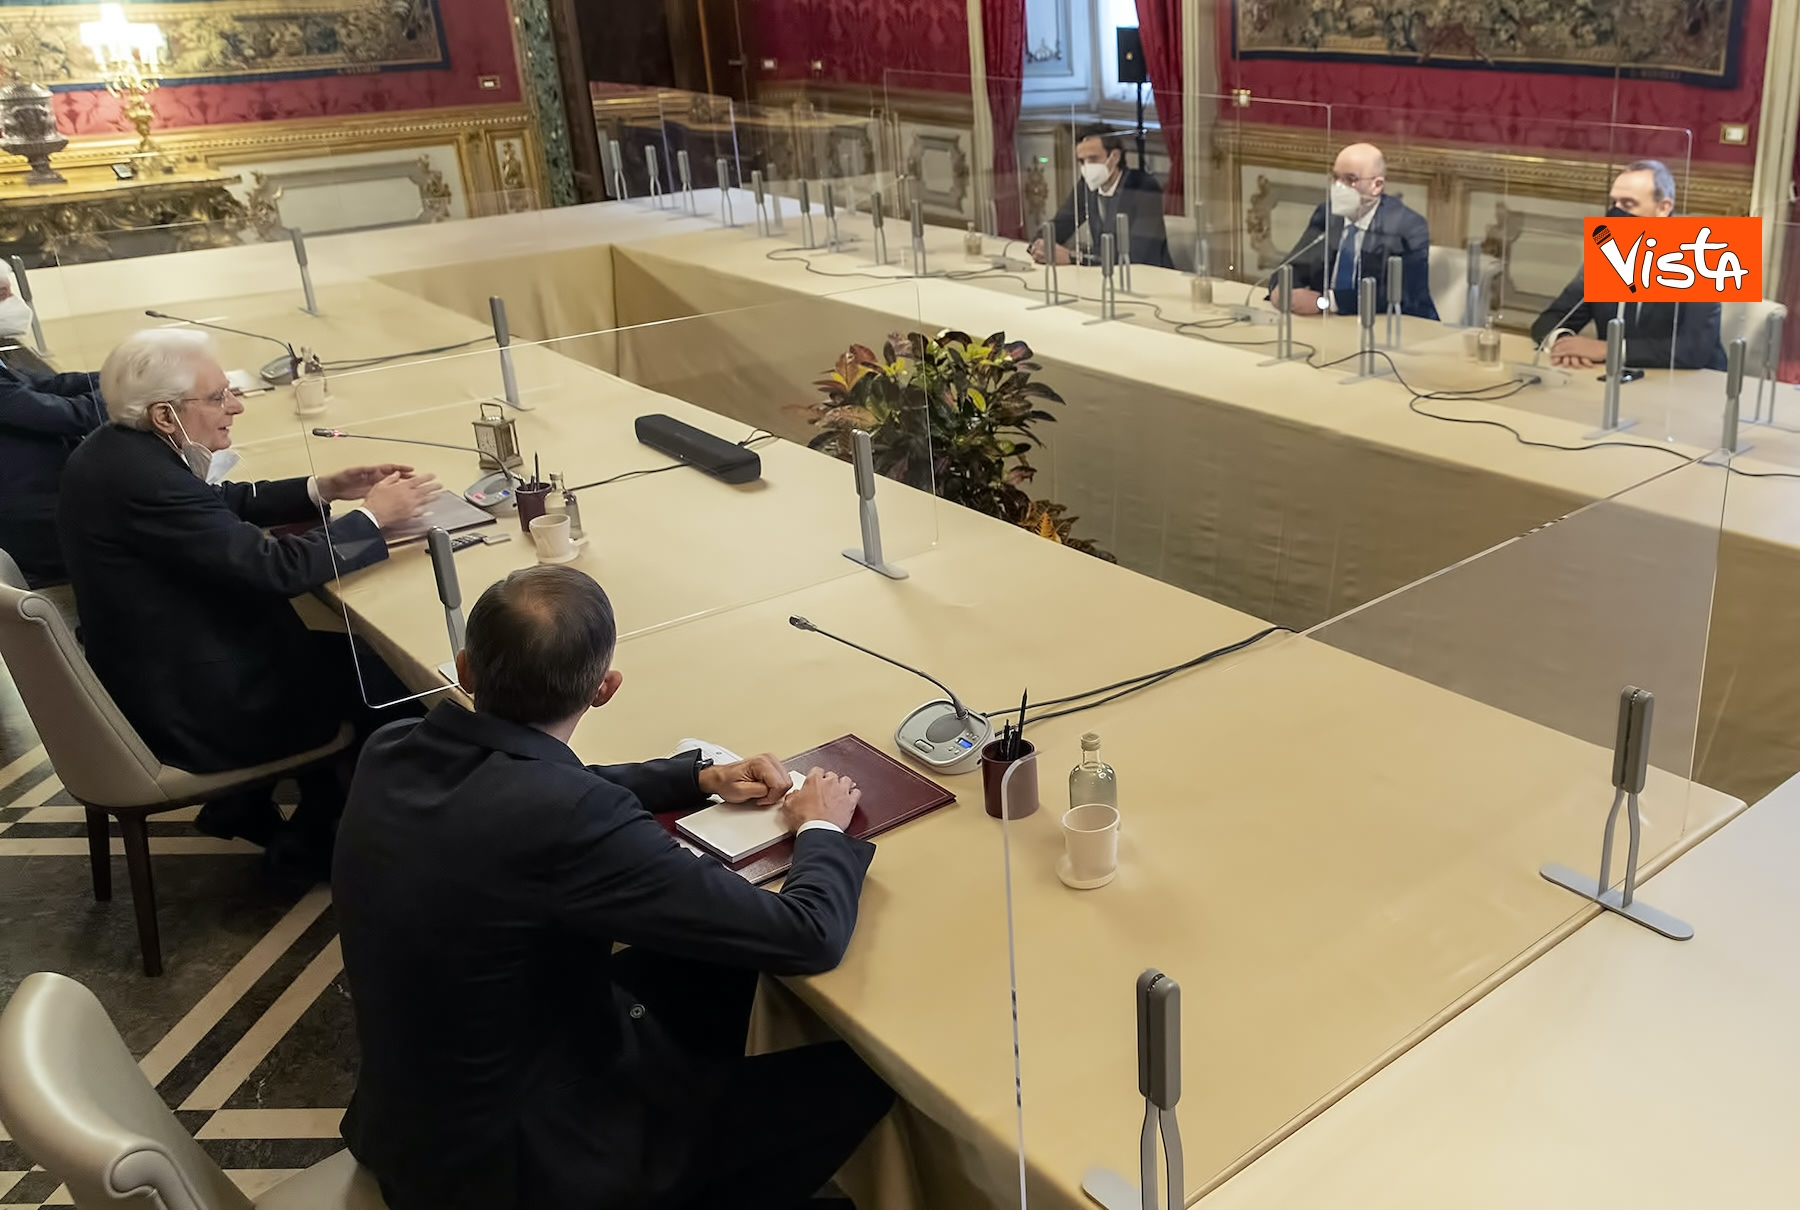 29-01 consultazioni crimi m5s italiani stufi dei teatrini_02